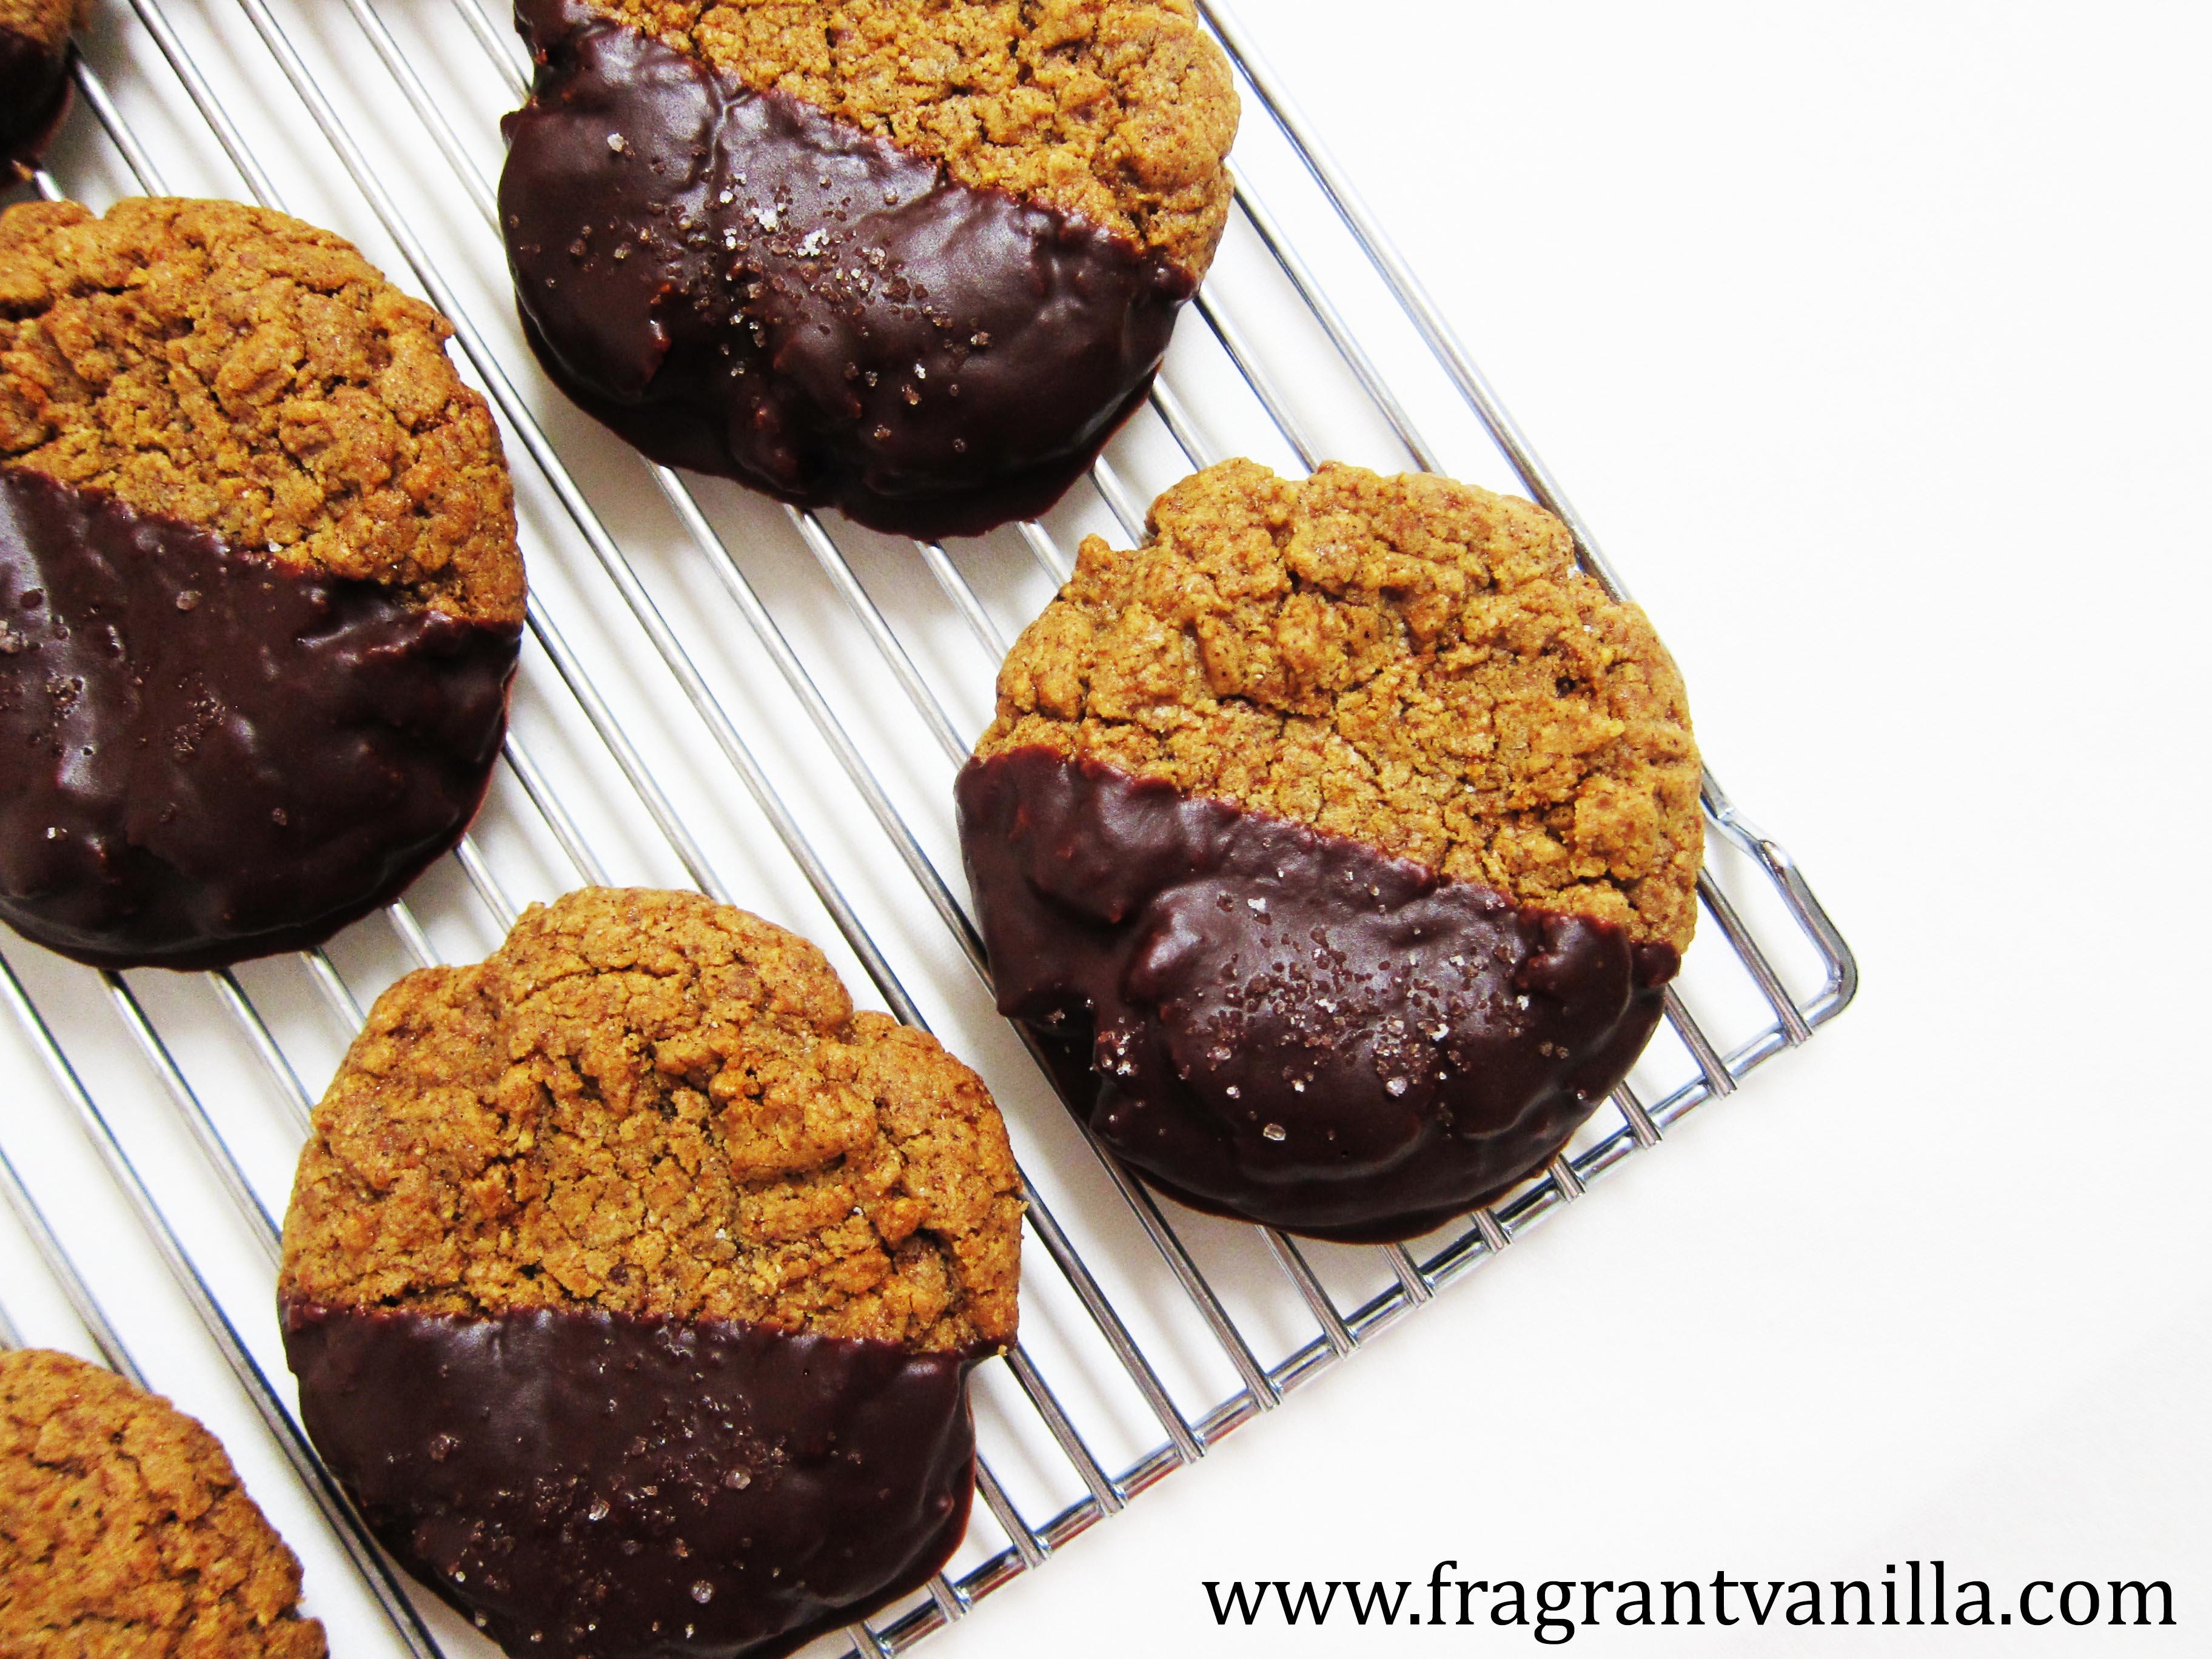 Vegan Chocolate DippedSalted AlmondButter Cookies